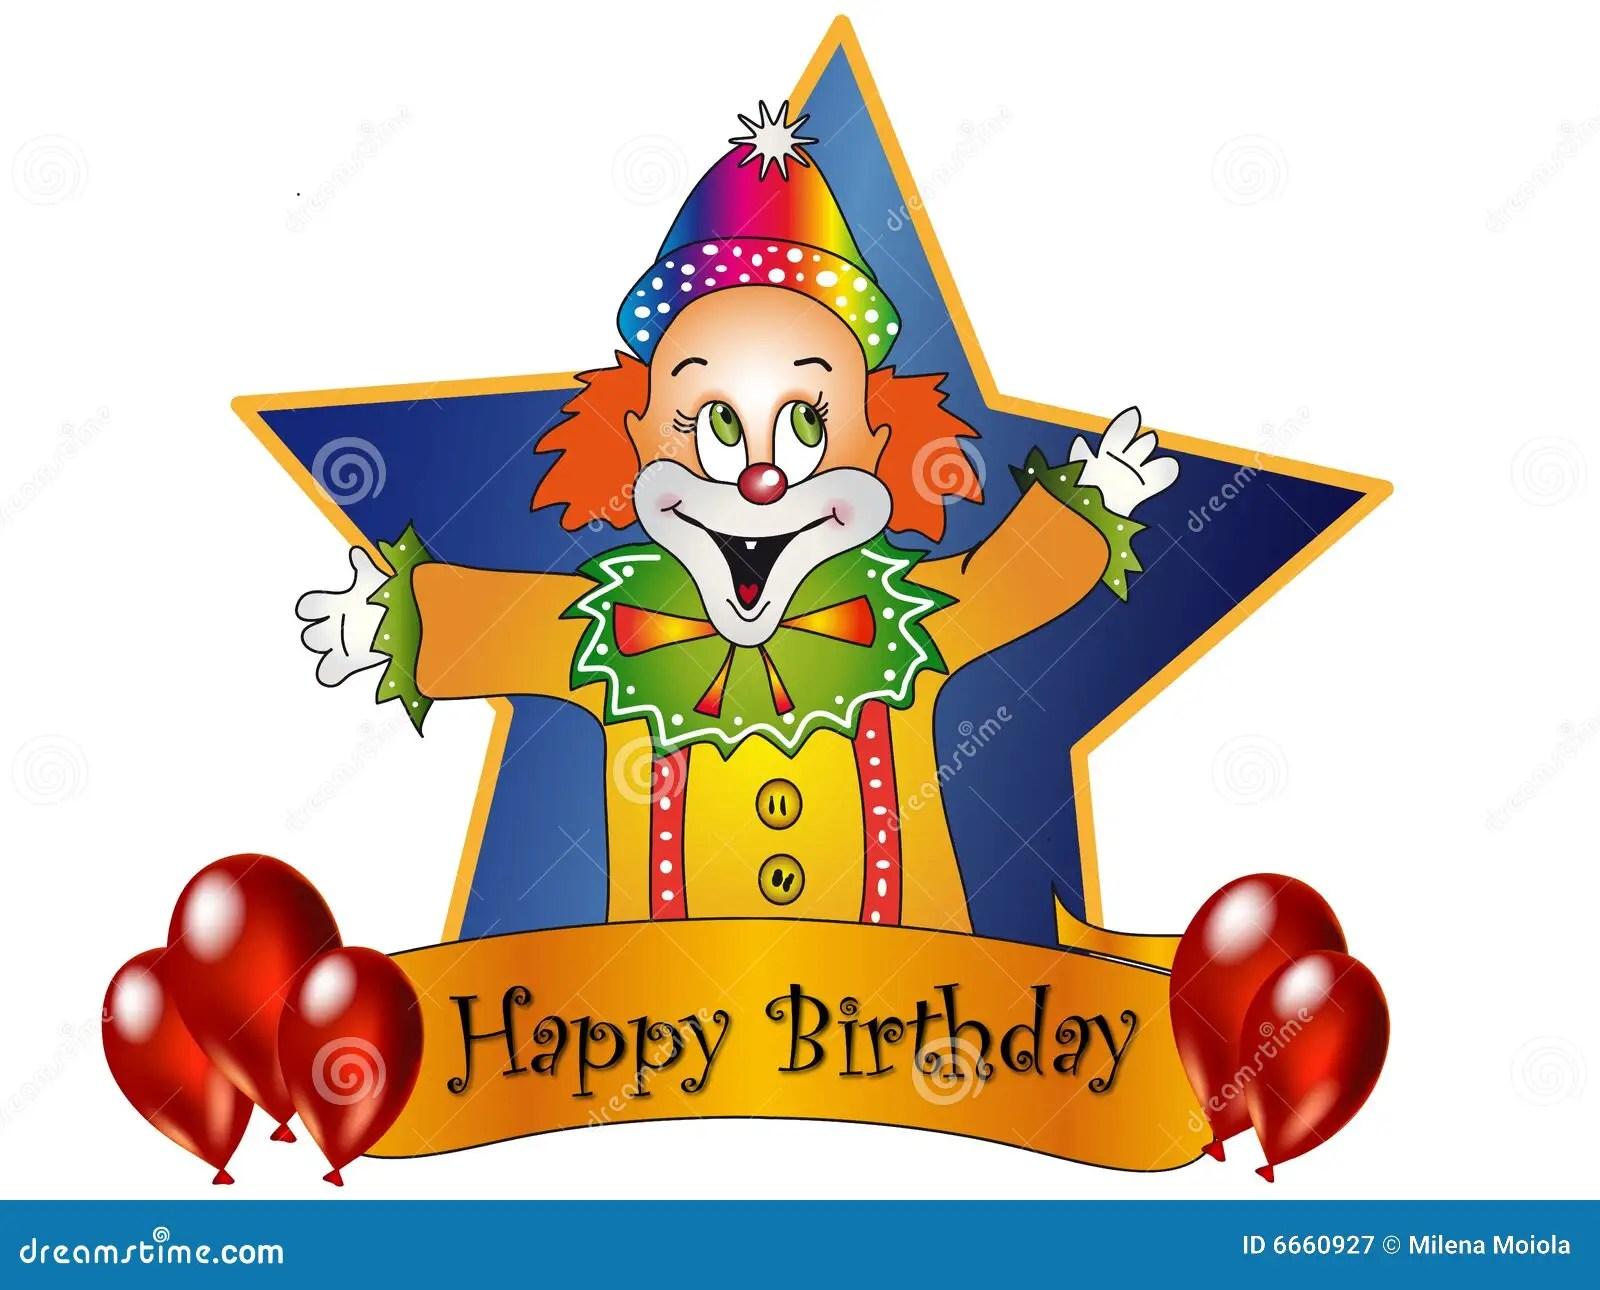 Happy Birthday Royalty Free Stock Photography Image 6660927